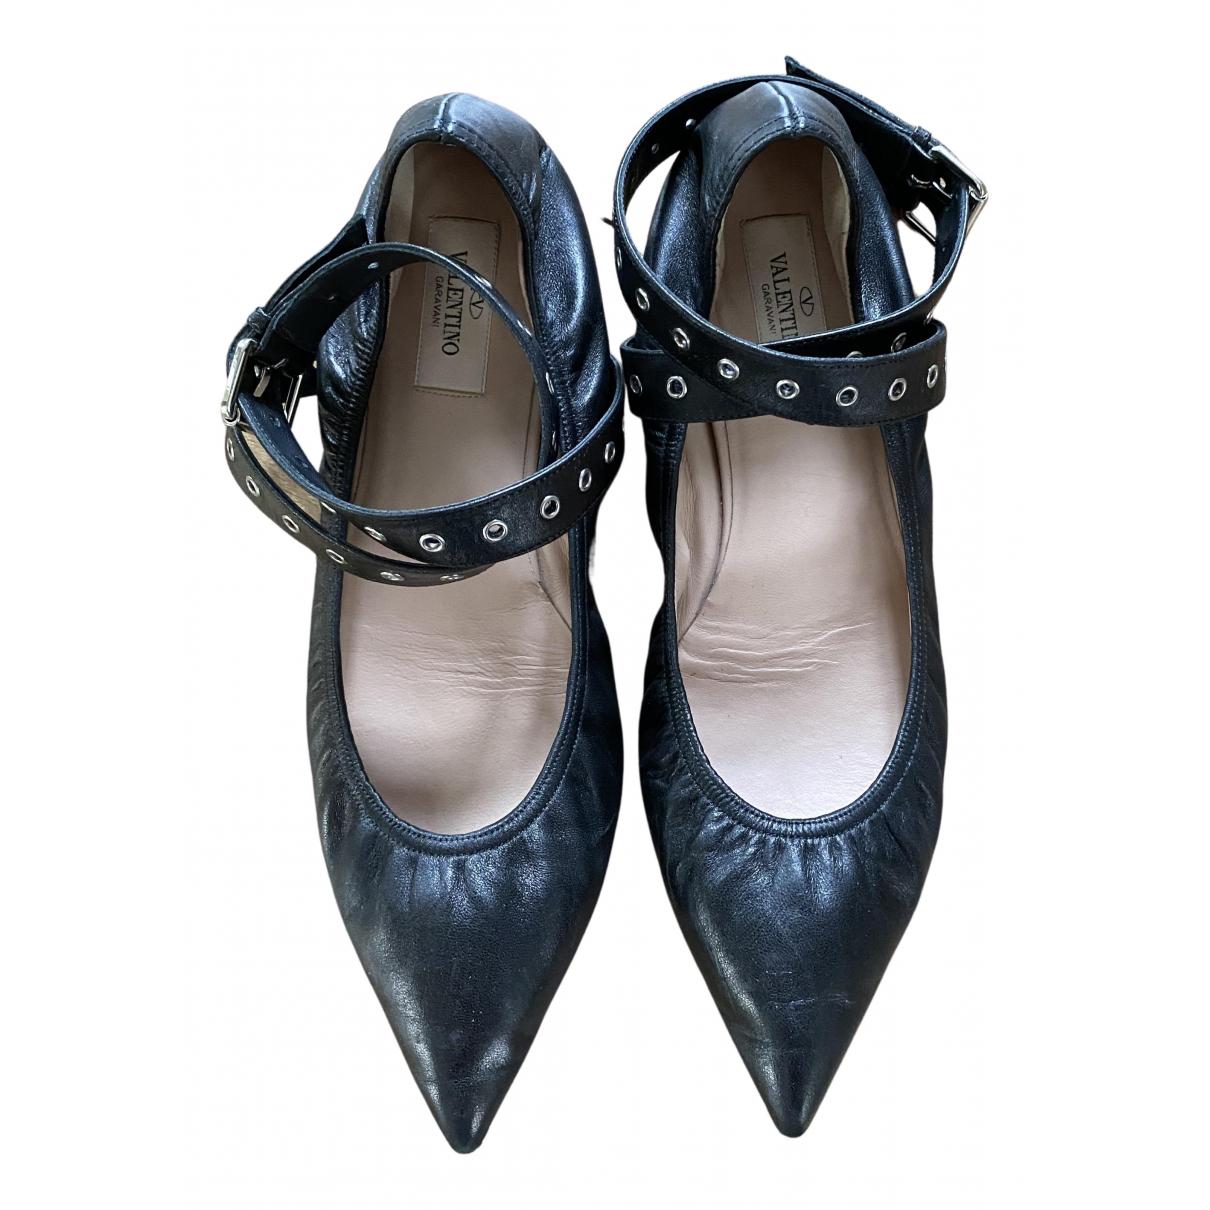 Valentino Garavani N Black Leather Ballet flats for Women 39.5 EU